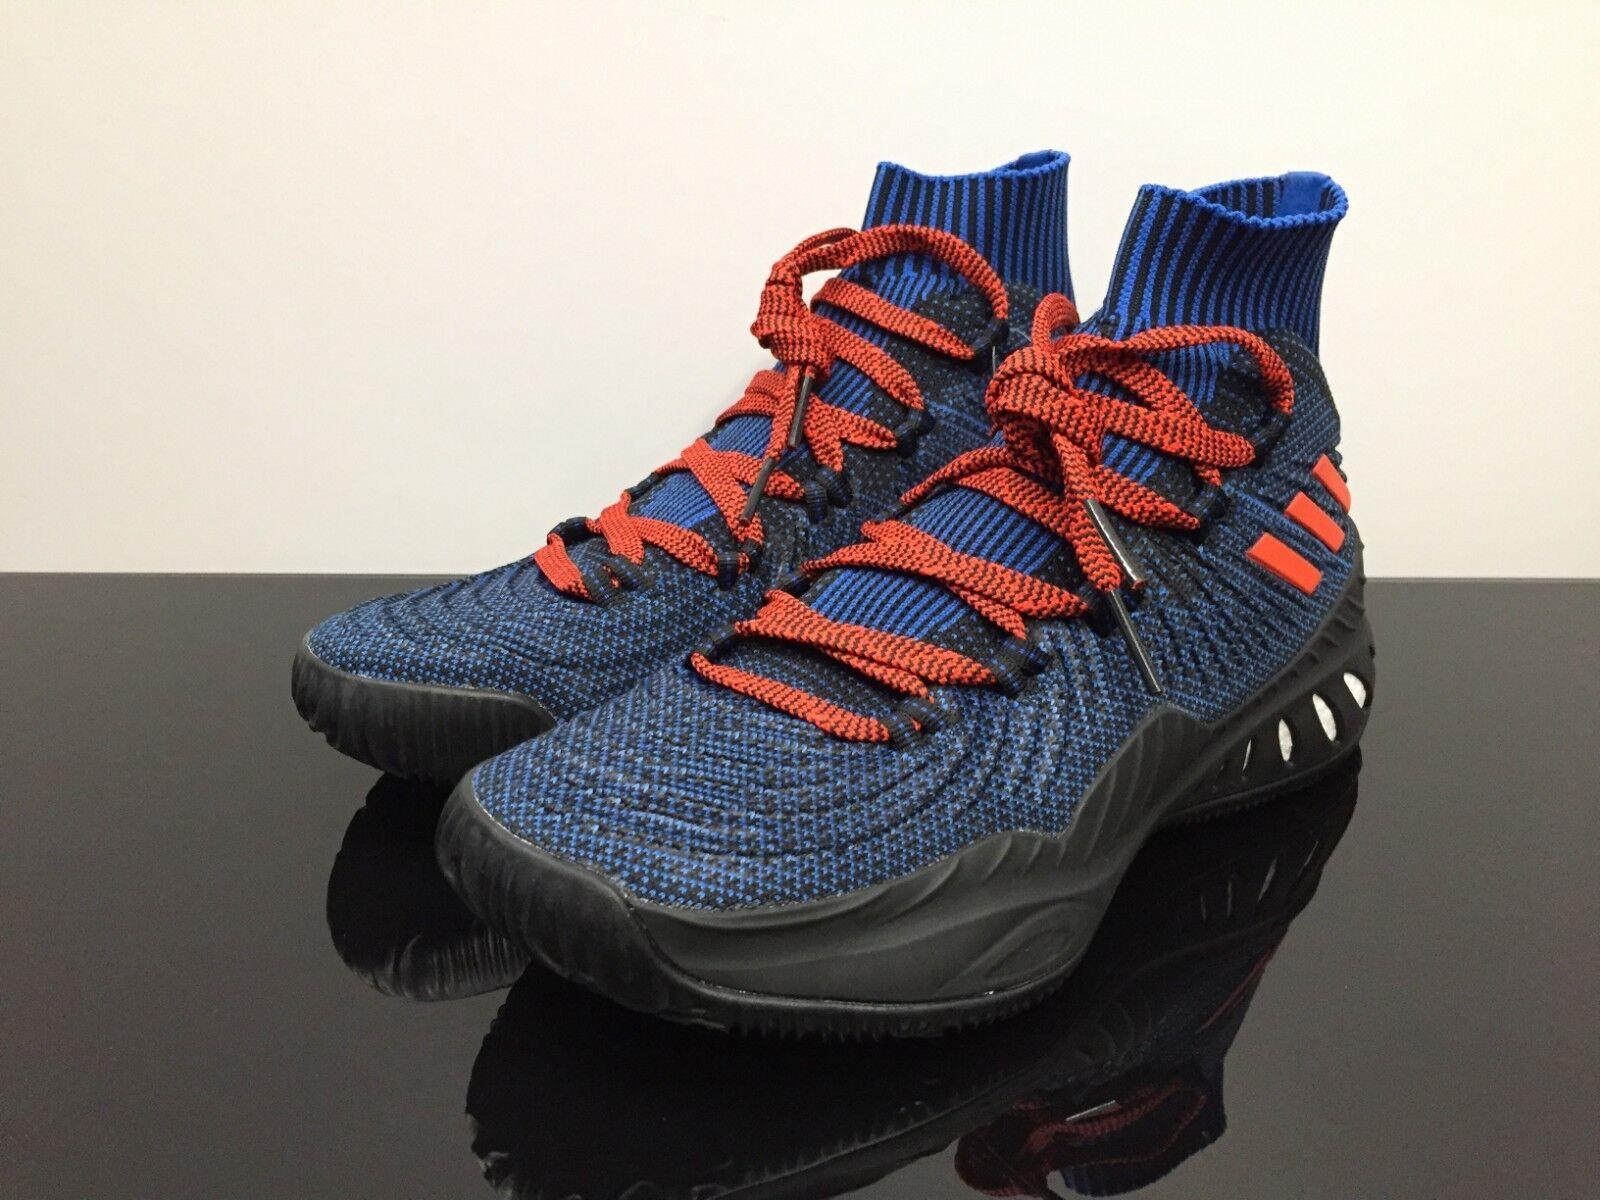 Adidas adilette primeknit Sock su tamaño 7 12 hombre  zapatilla blanco Tint